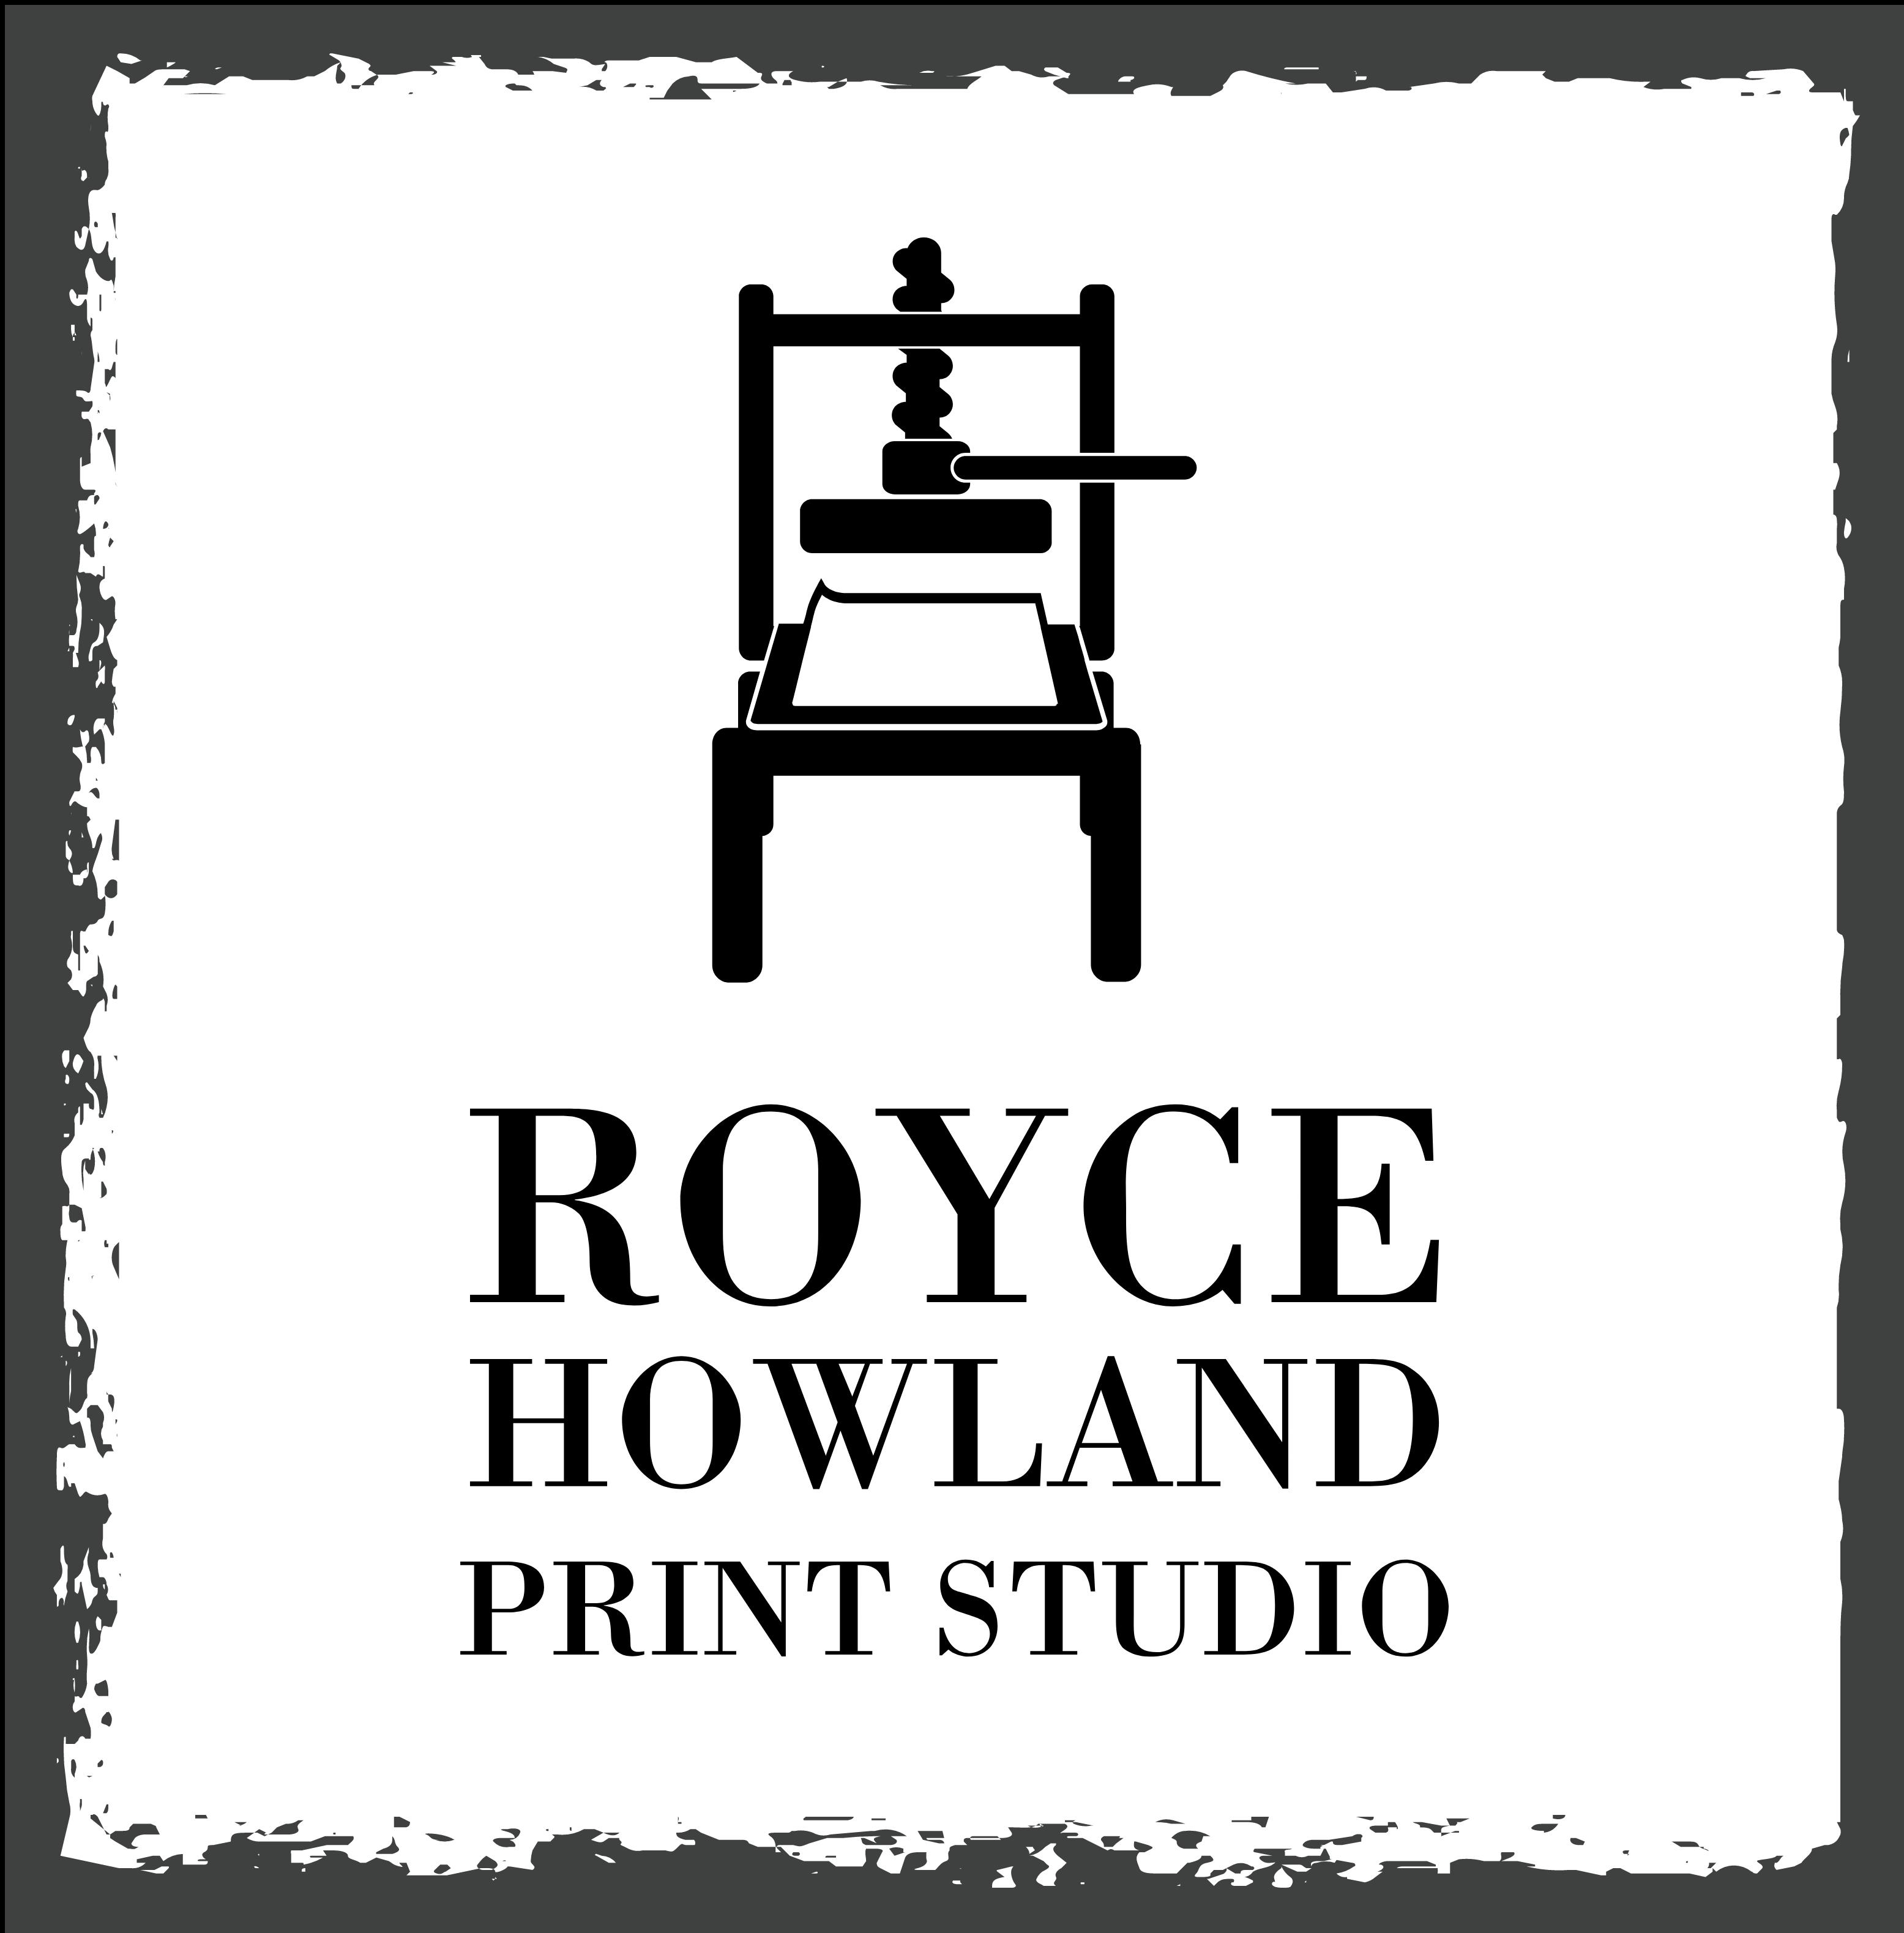 Royce Howland Print Studio